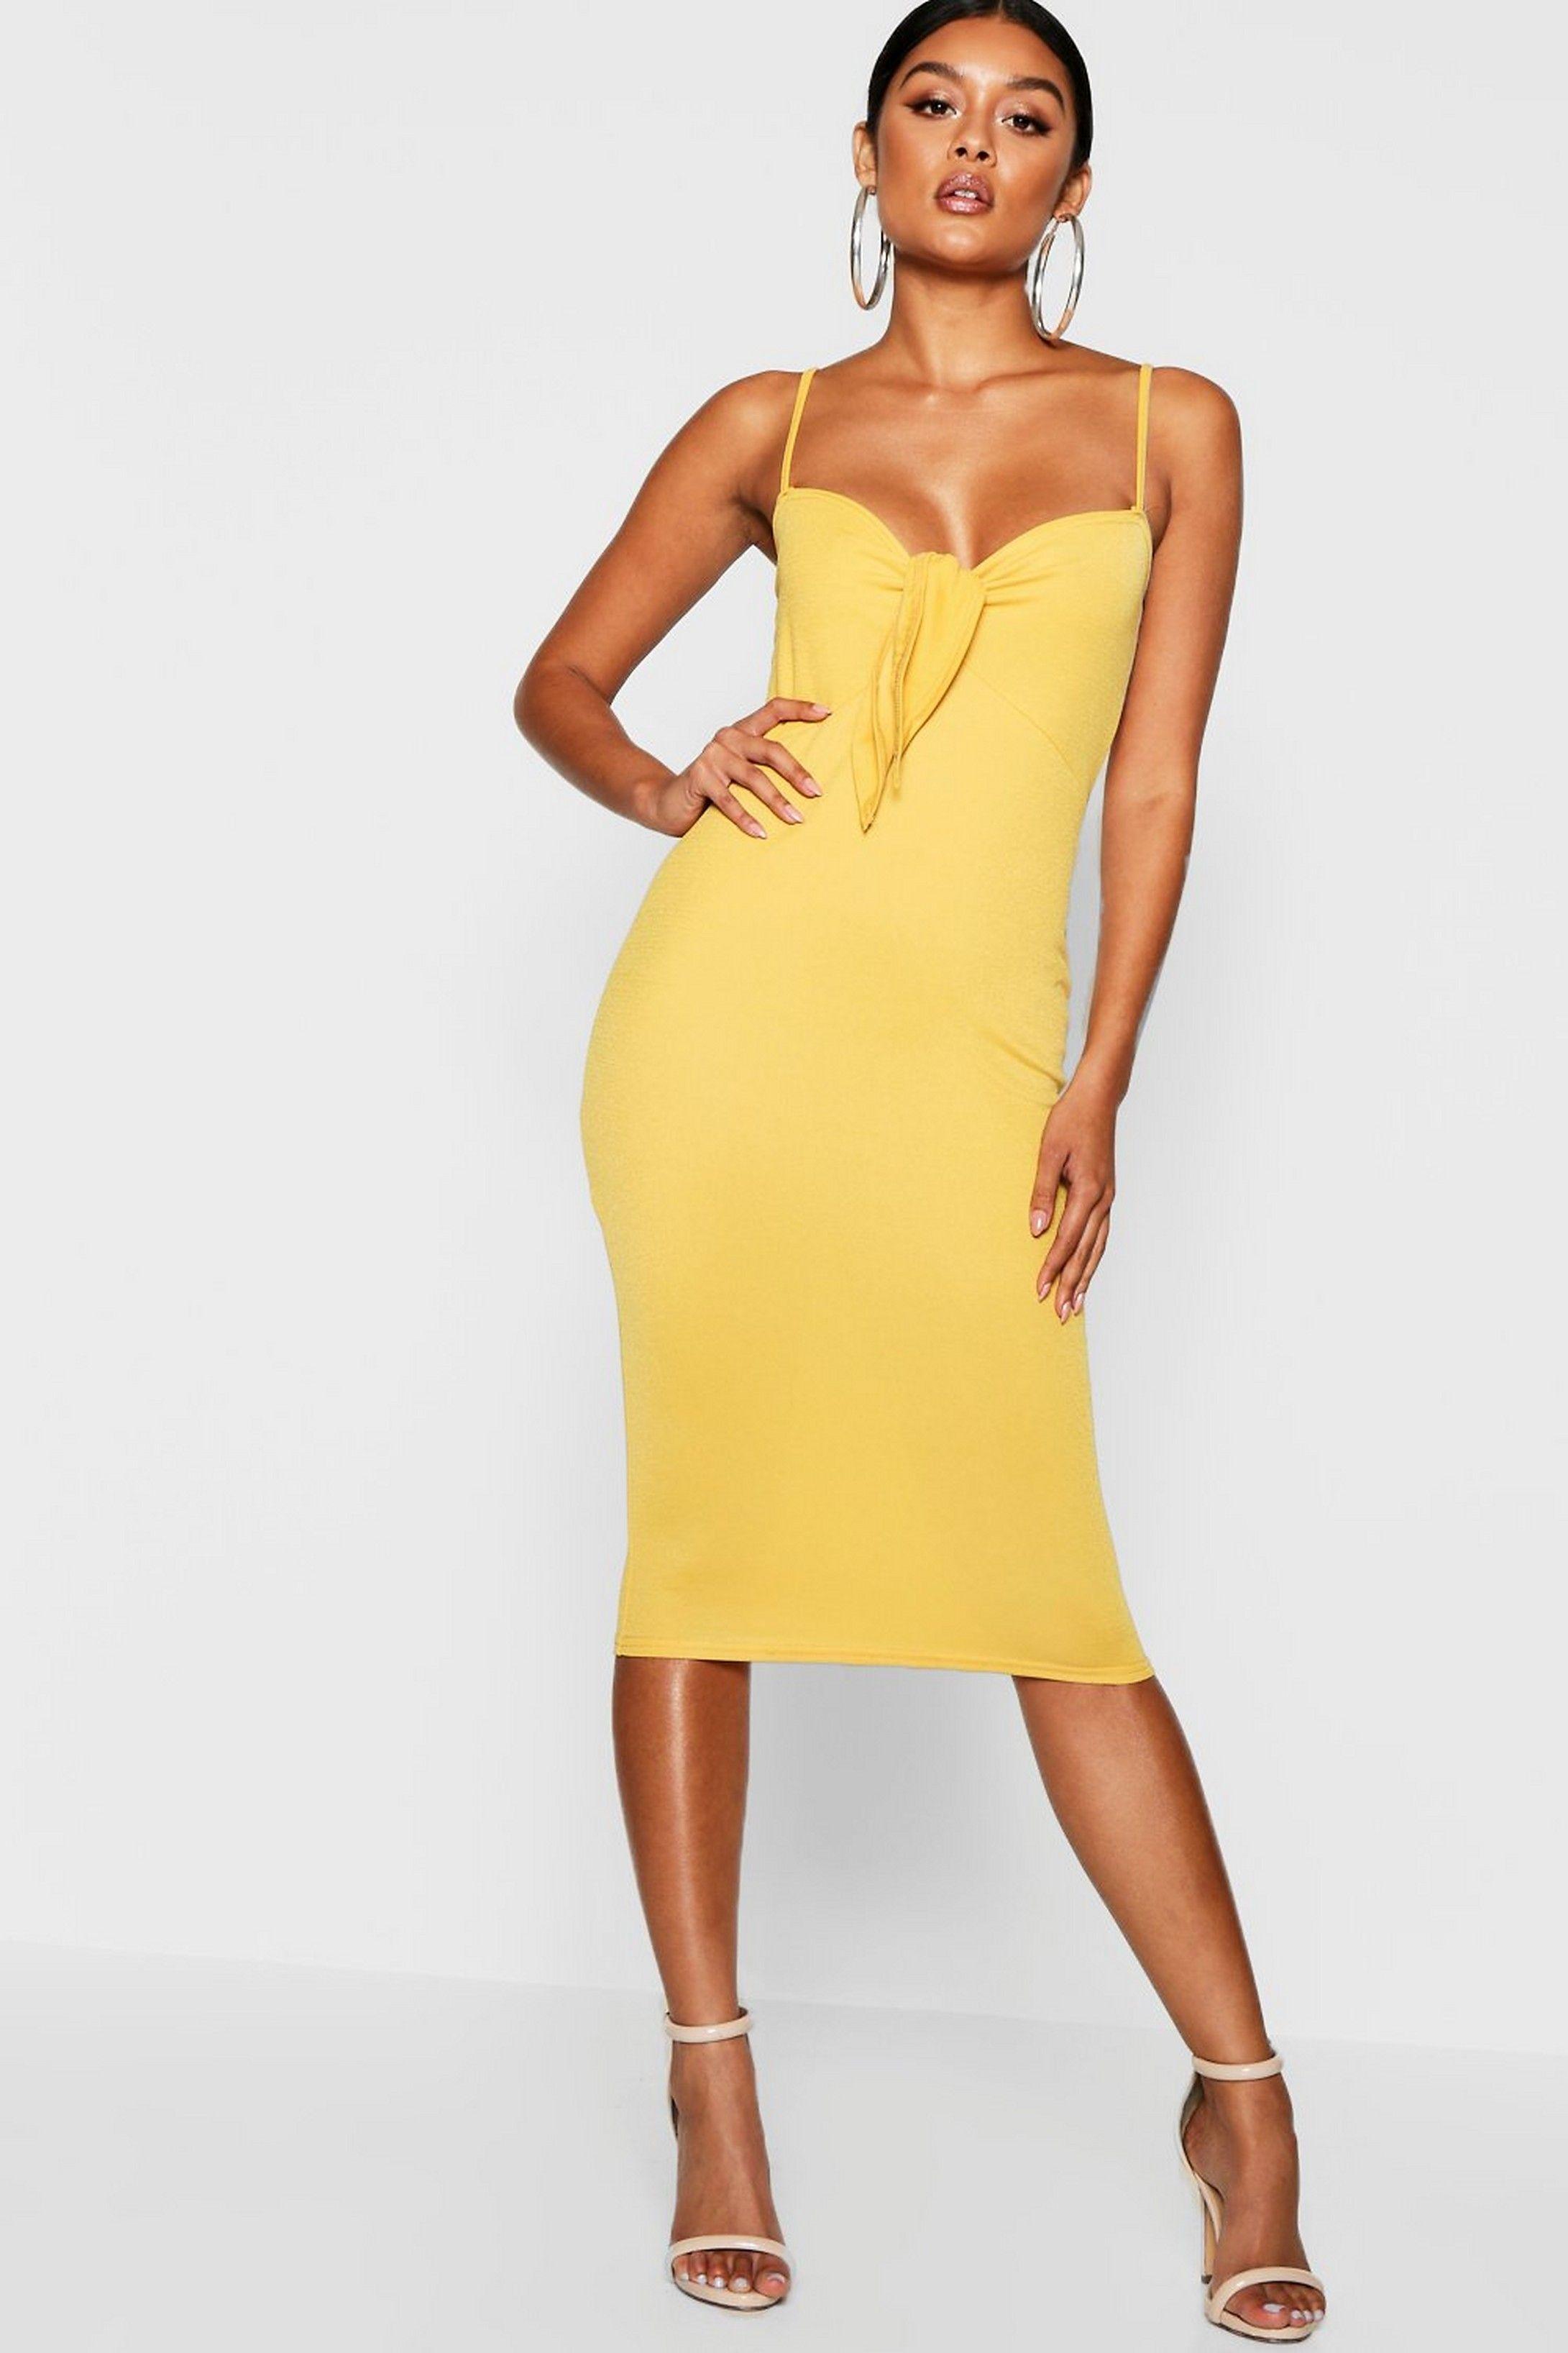 Women S Skinny Strap Tie Front Midi Dress Boohoo Uk Yellow Midi Dress Midi Dress Strappy Midi Dress [ 3272 x 2181 Pixel ]